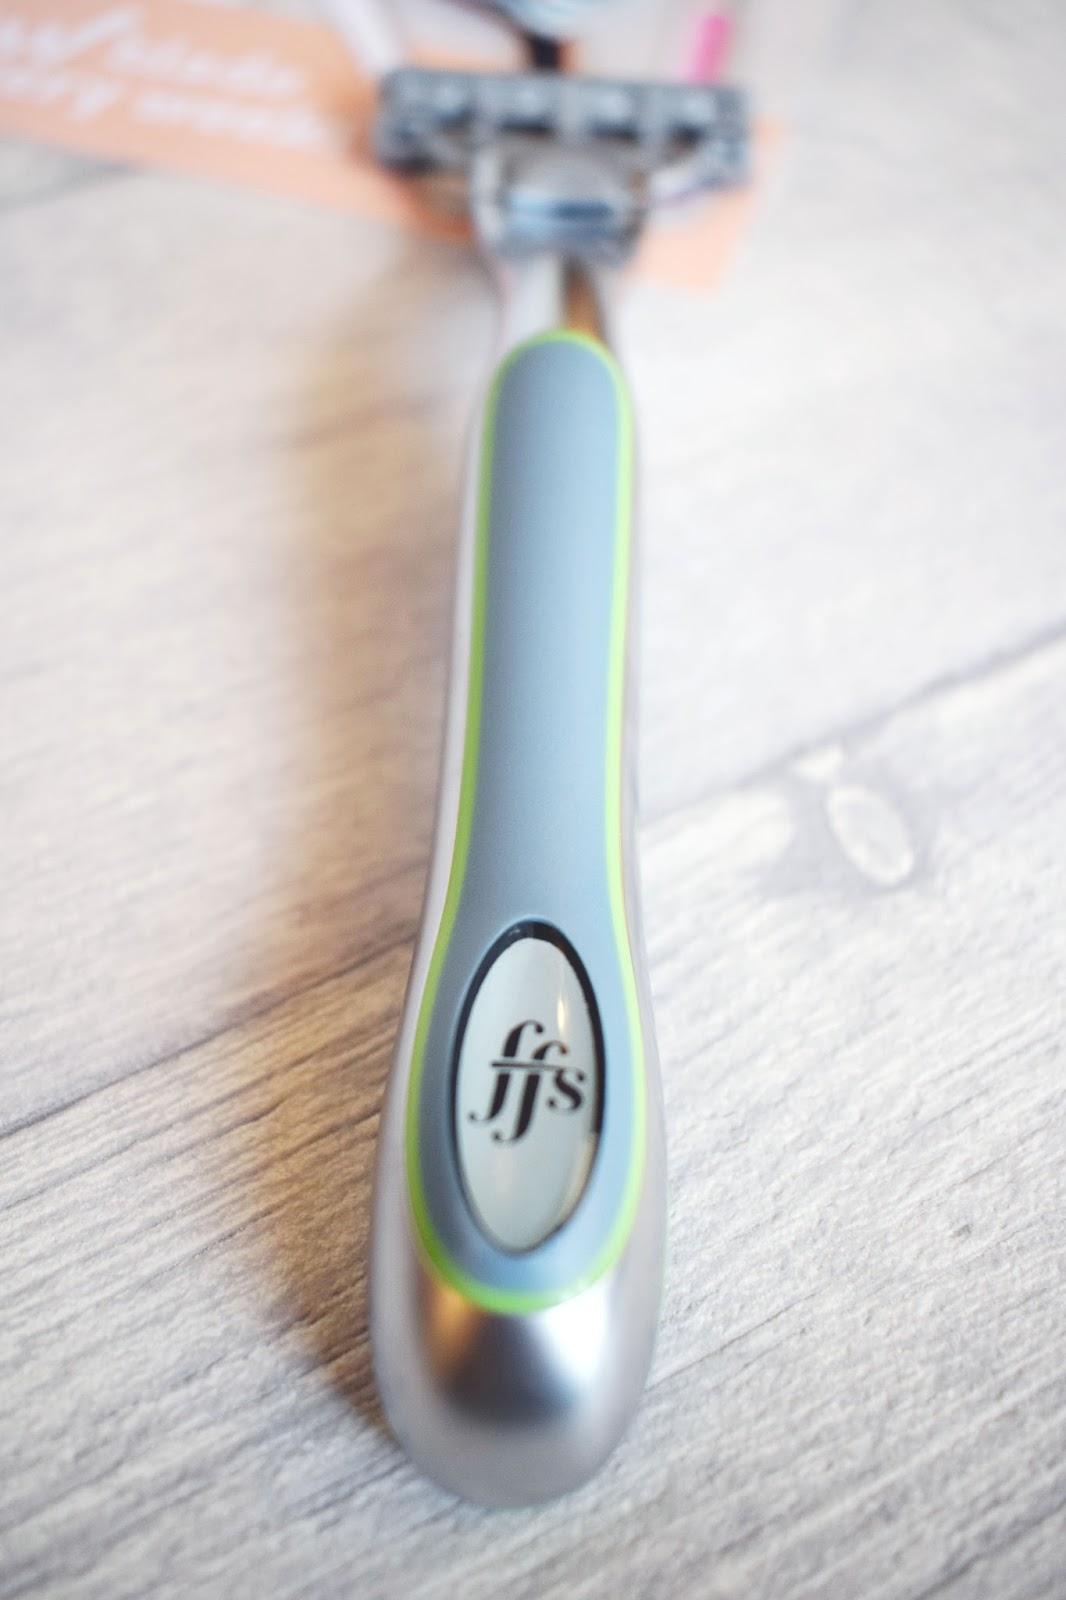 lebellelavie - In need of Friction Free Shaving?